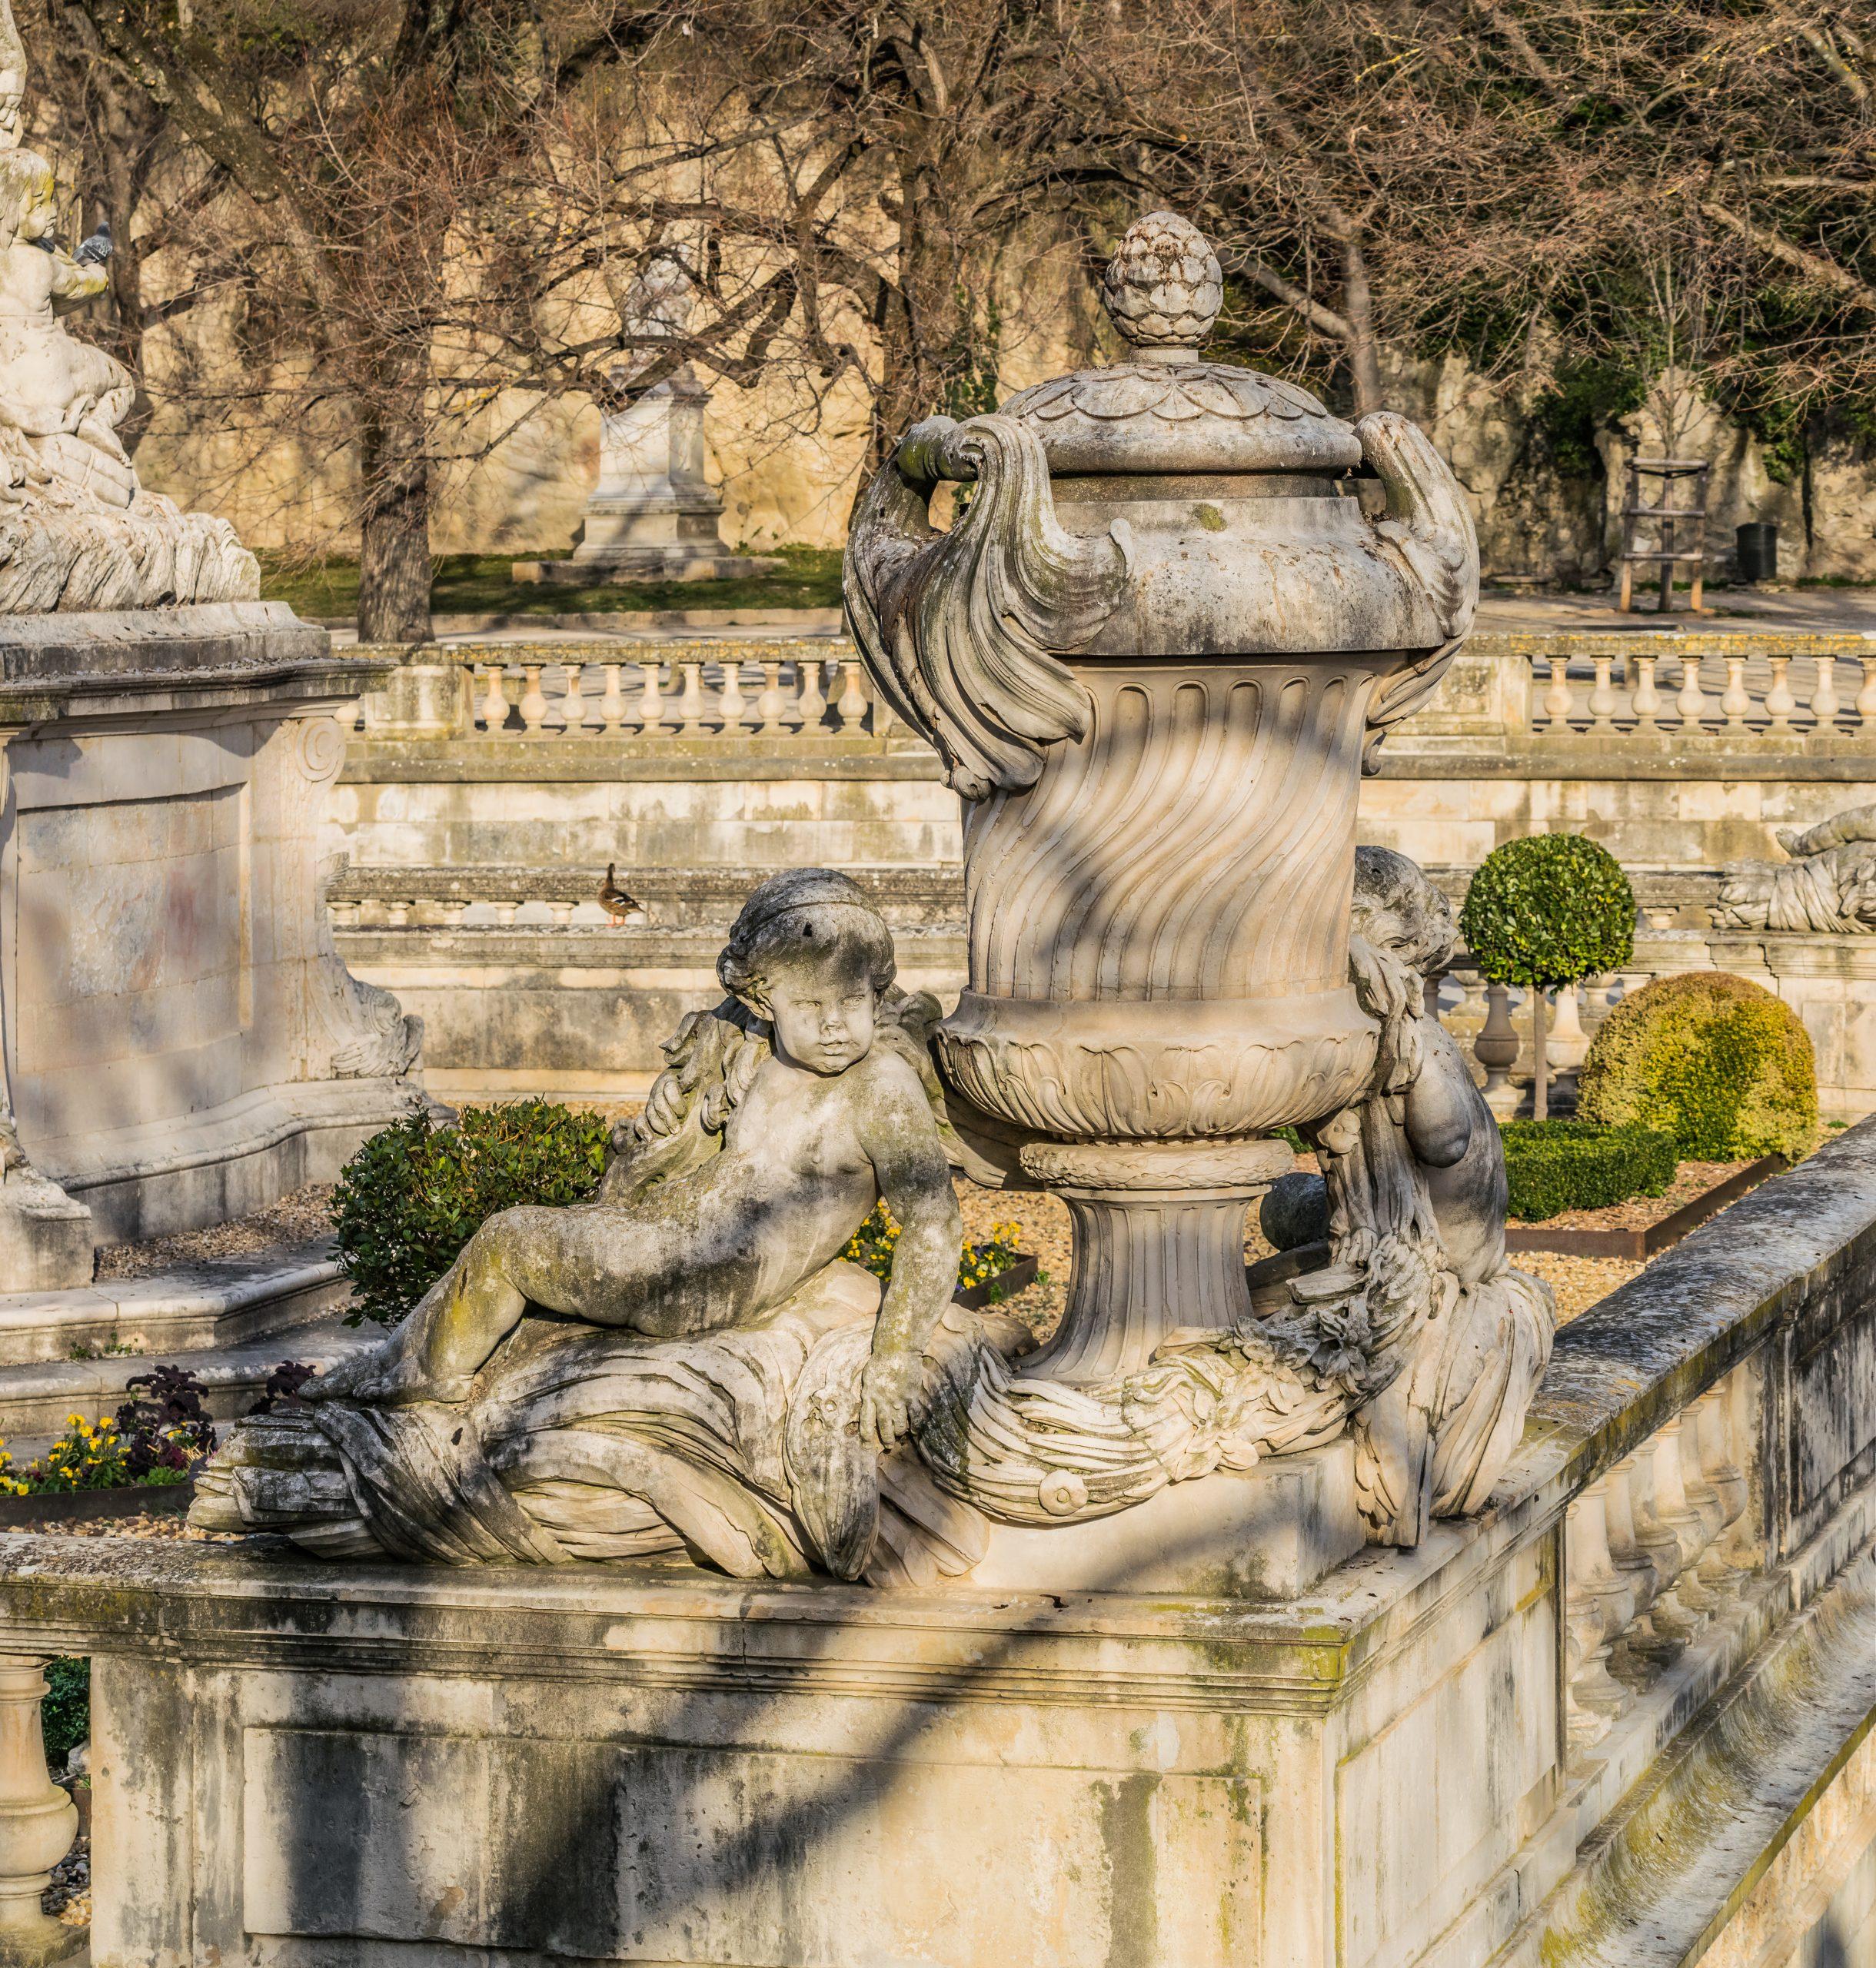 File:statue In Jardins De La Fontaine In Nimes 18.jpg ... avec Statue Fontaine De Jardin